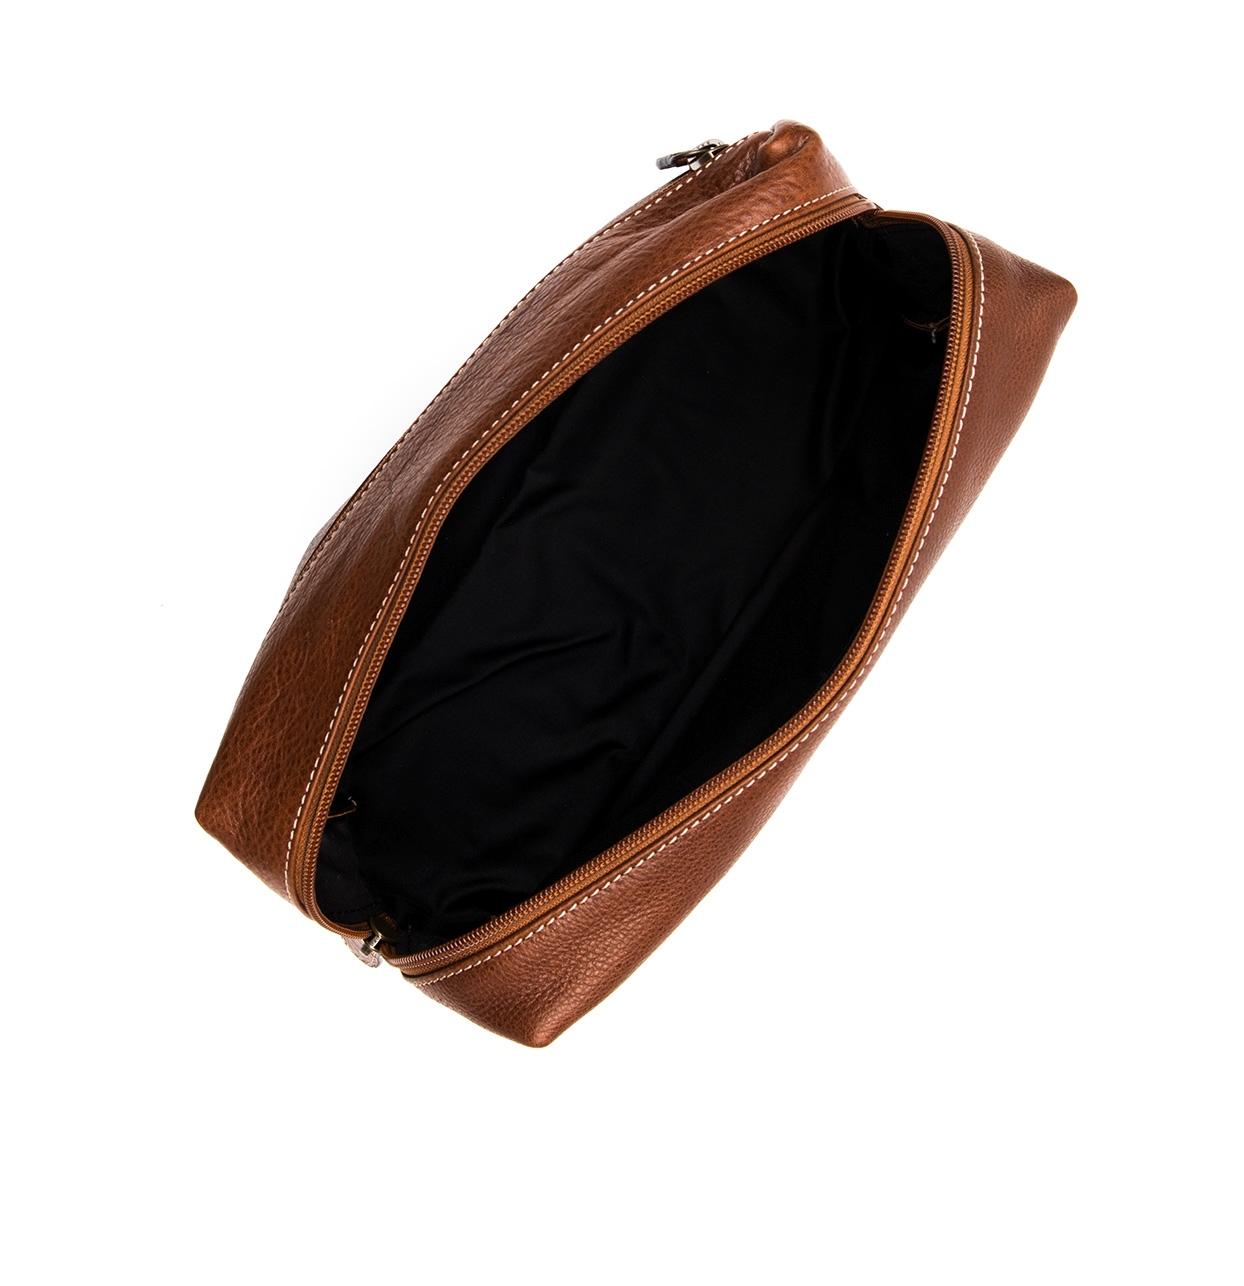 Neceser de piel color marrón natural, modelo TRAVIATA - Ítem1